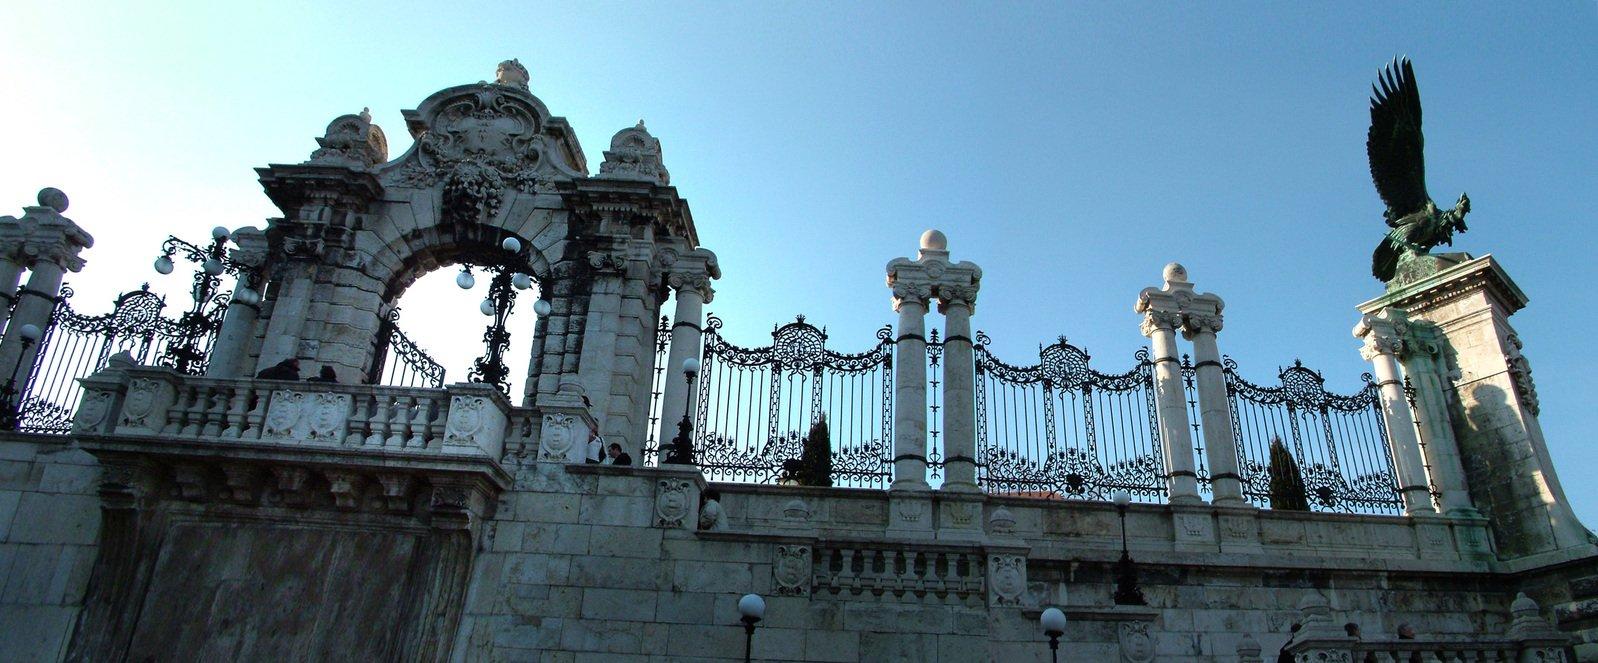 Gate on Capital Hill (Budapest, Hungary)